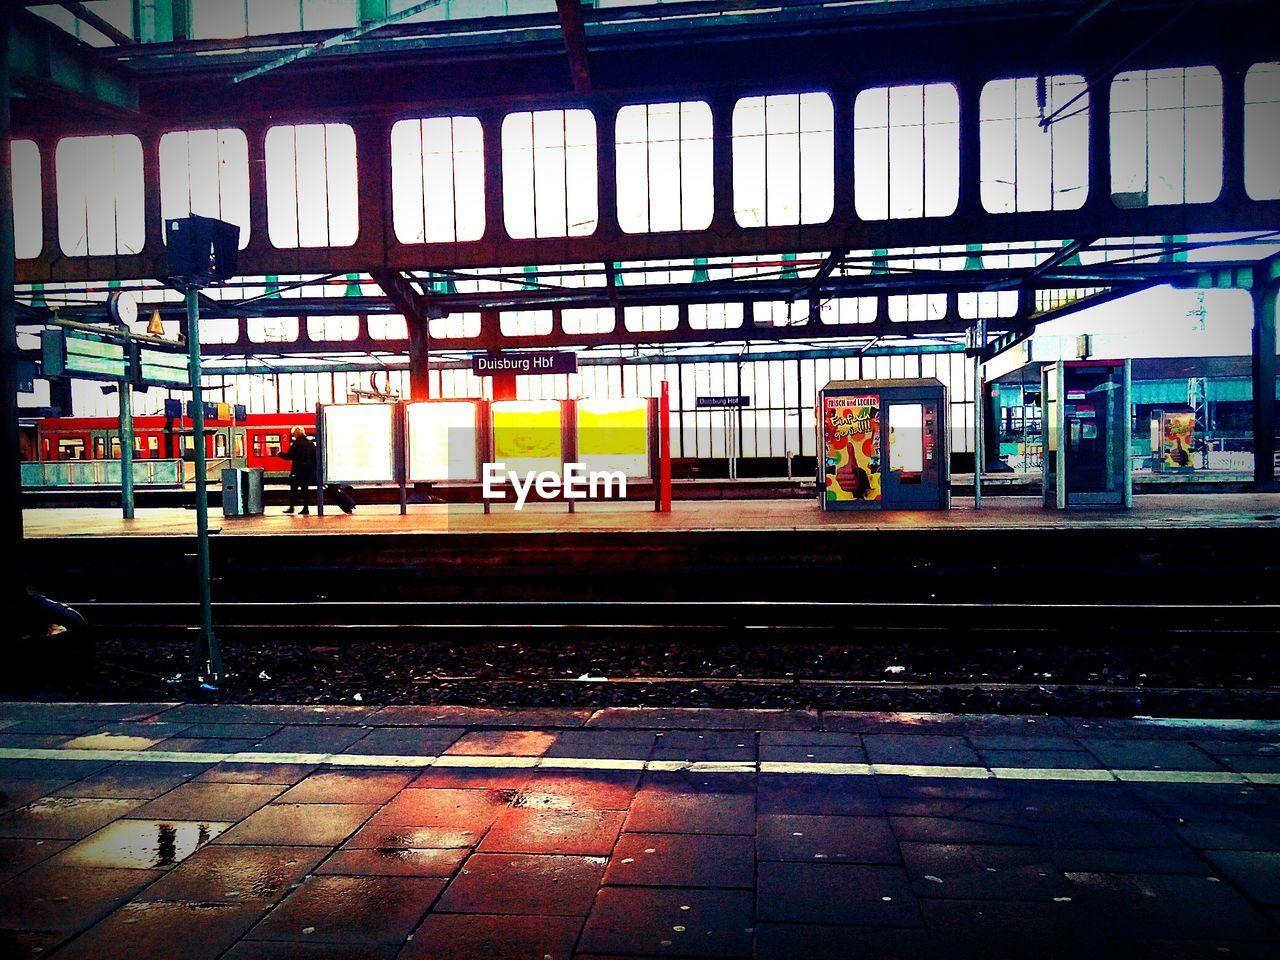 Duisburg Hauptbahnhof Railroad Station